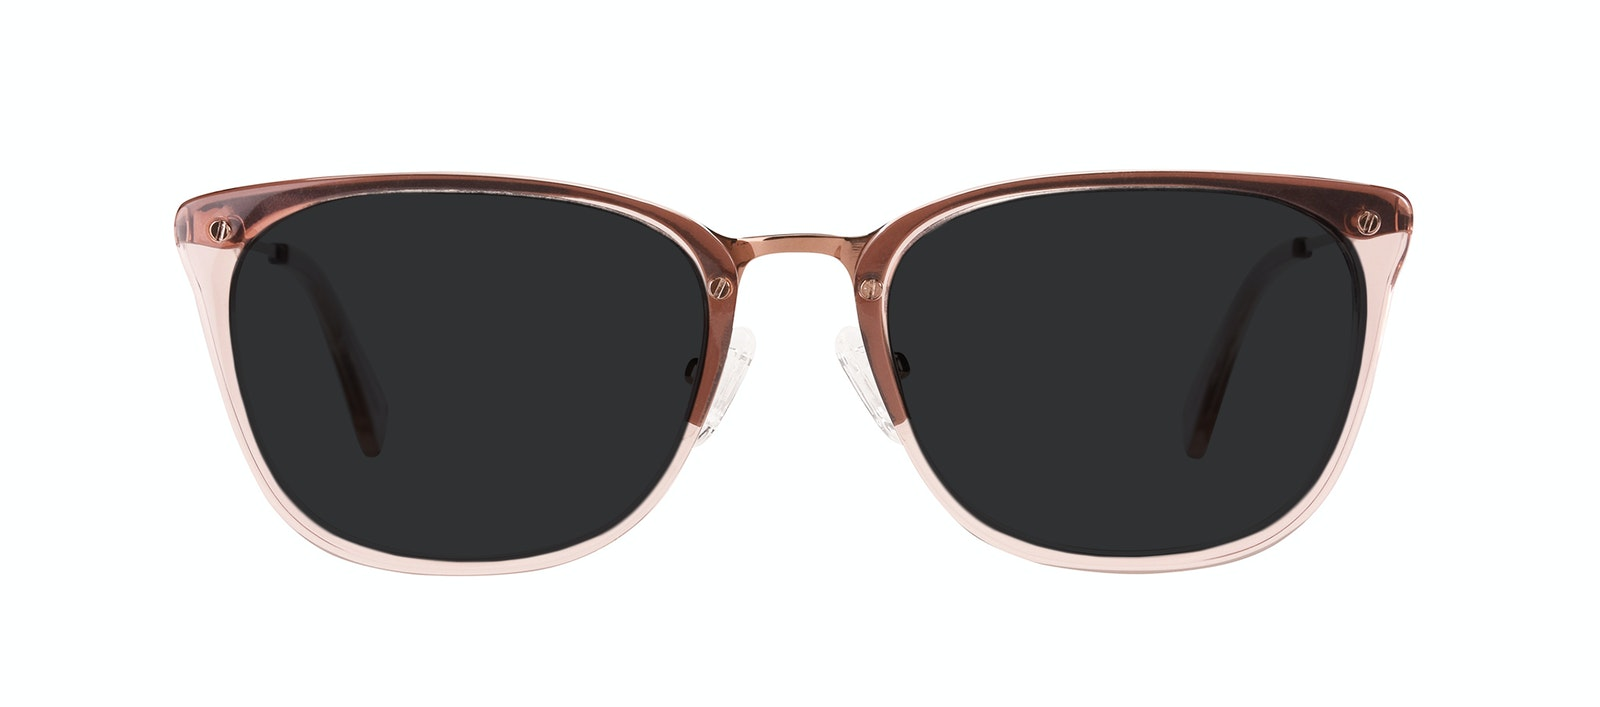 Affordable Fashion Glasses Rectangle Sunglasses Women Wonder Rose Front